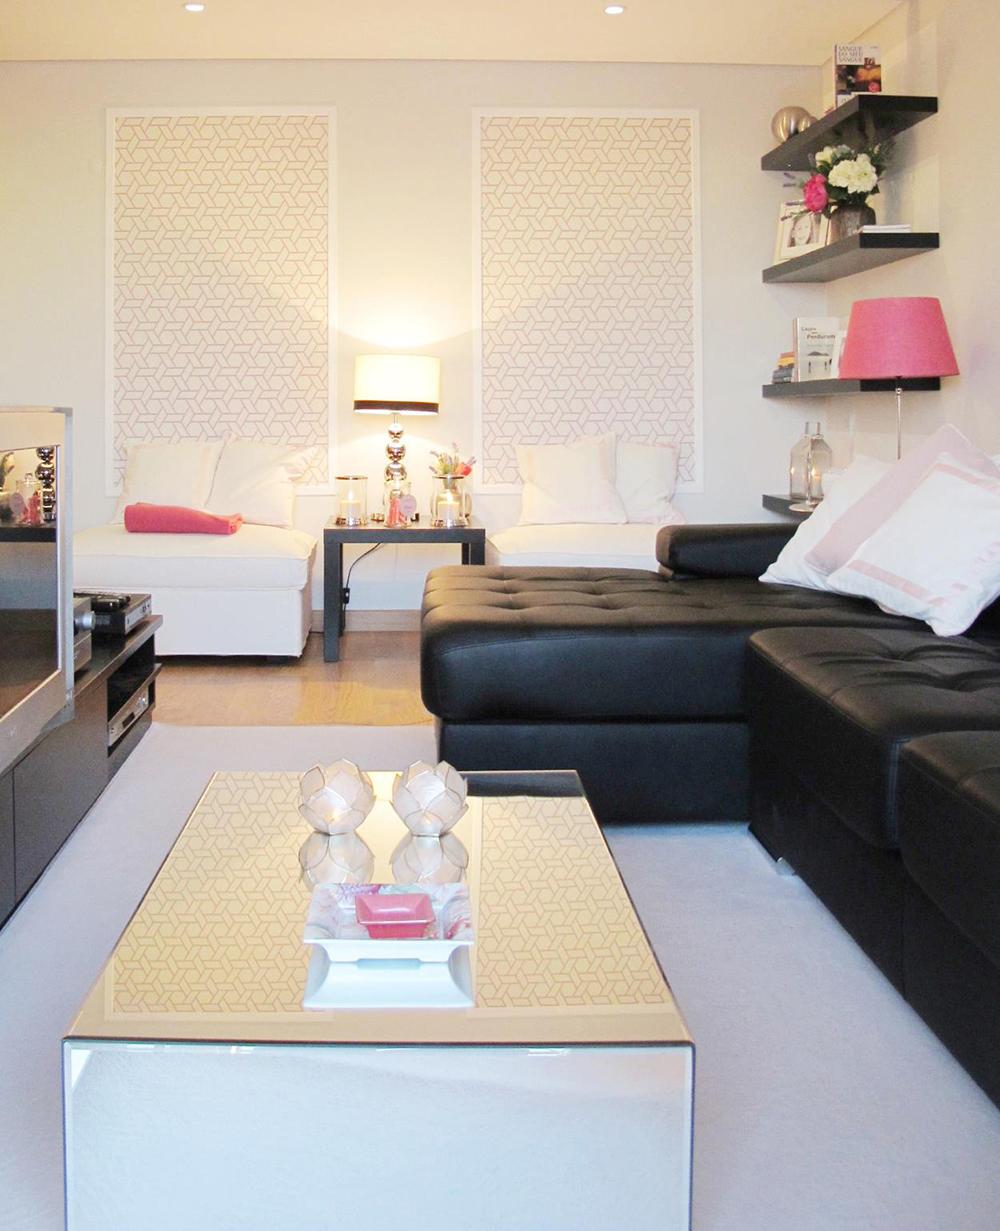 02-catarina-batista-arquitectura-design-interior-apatamento-livingroom-entrecampos-lisboa.jpg